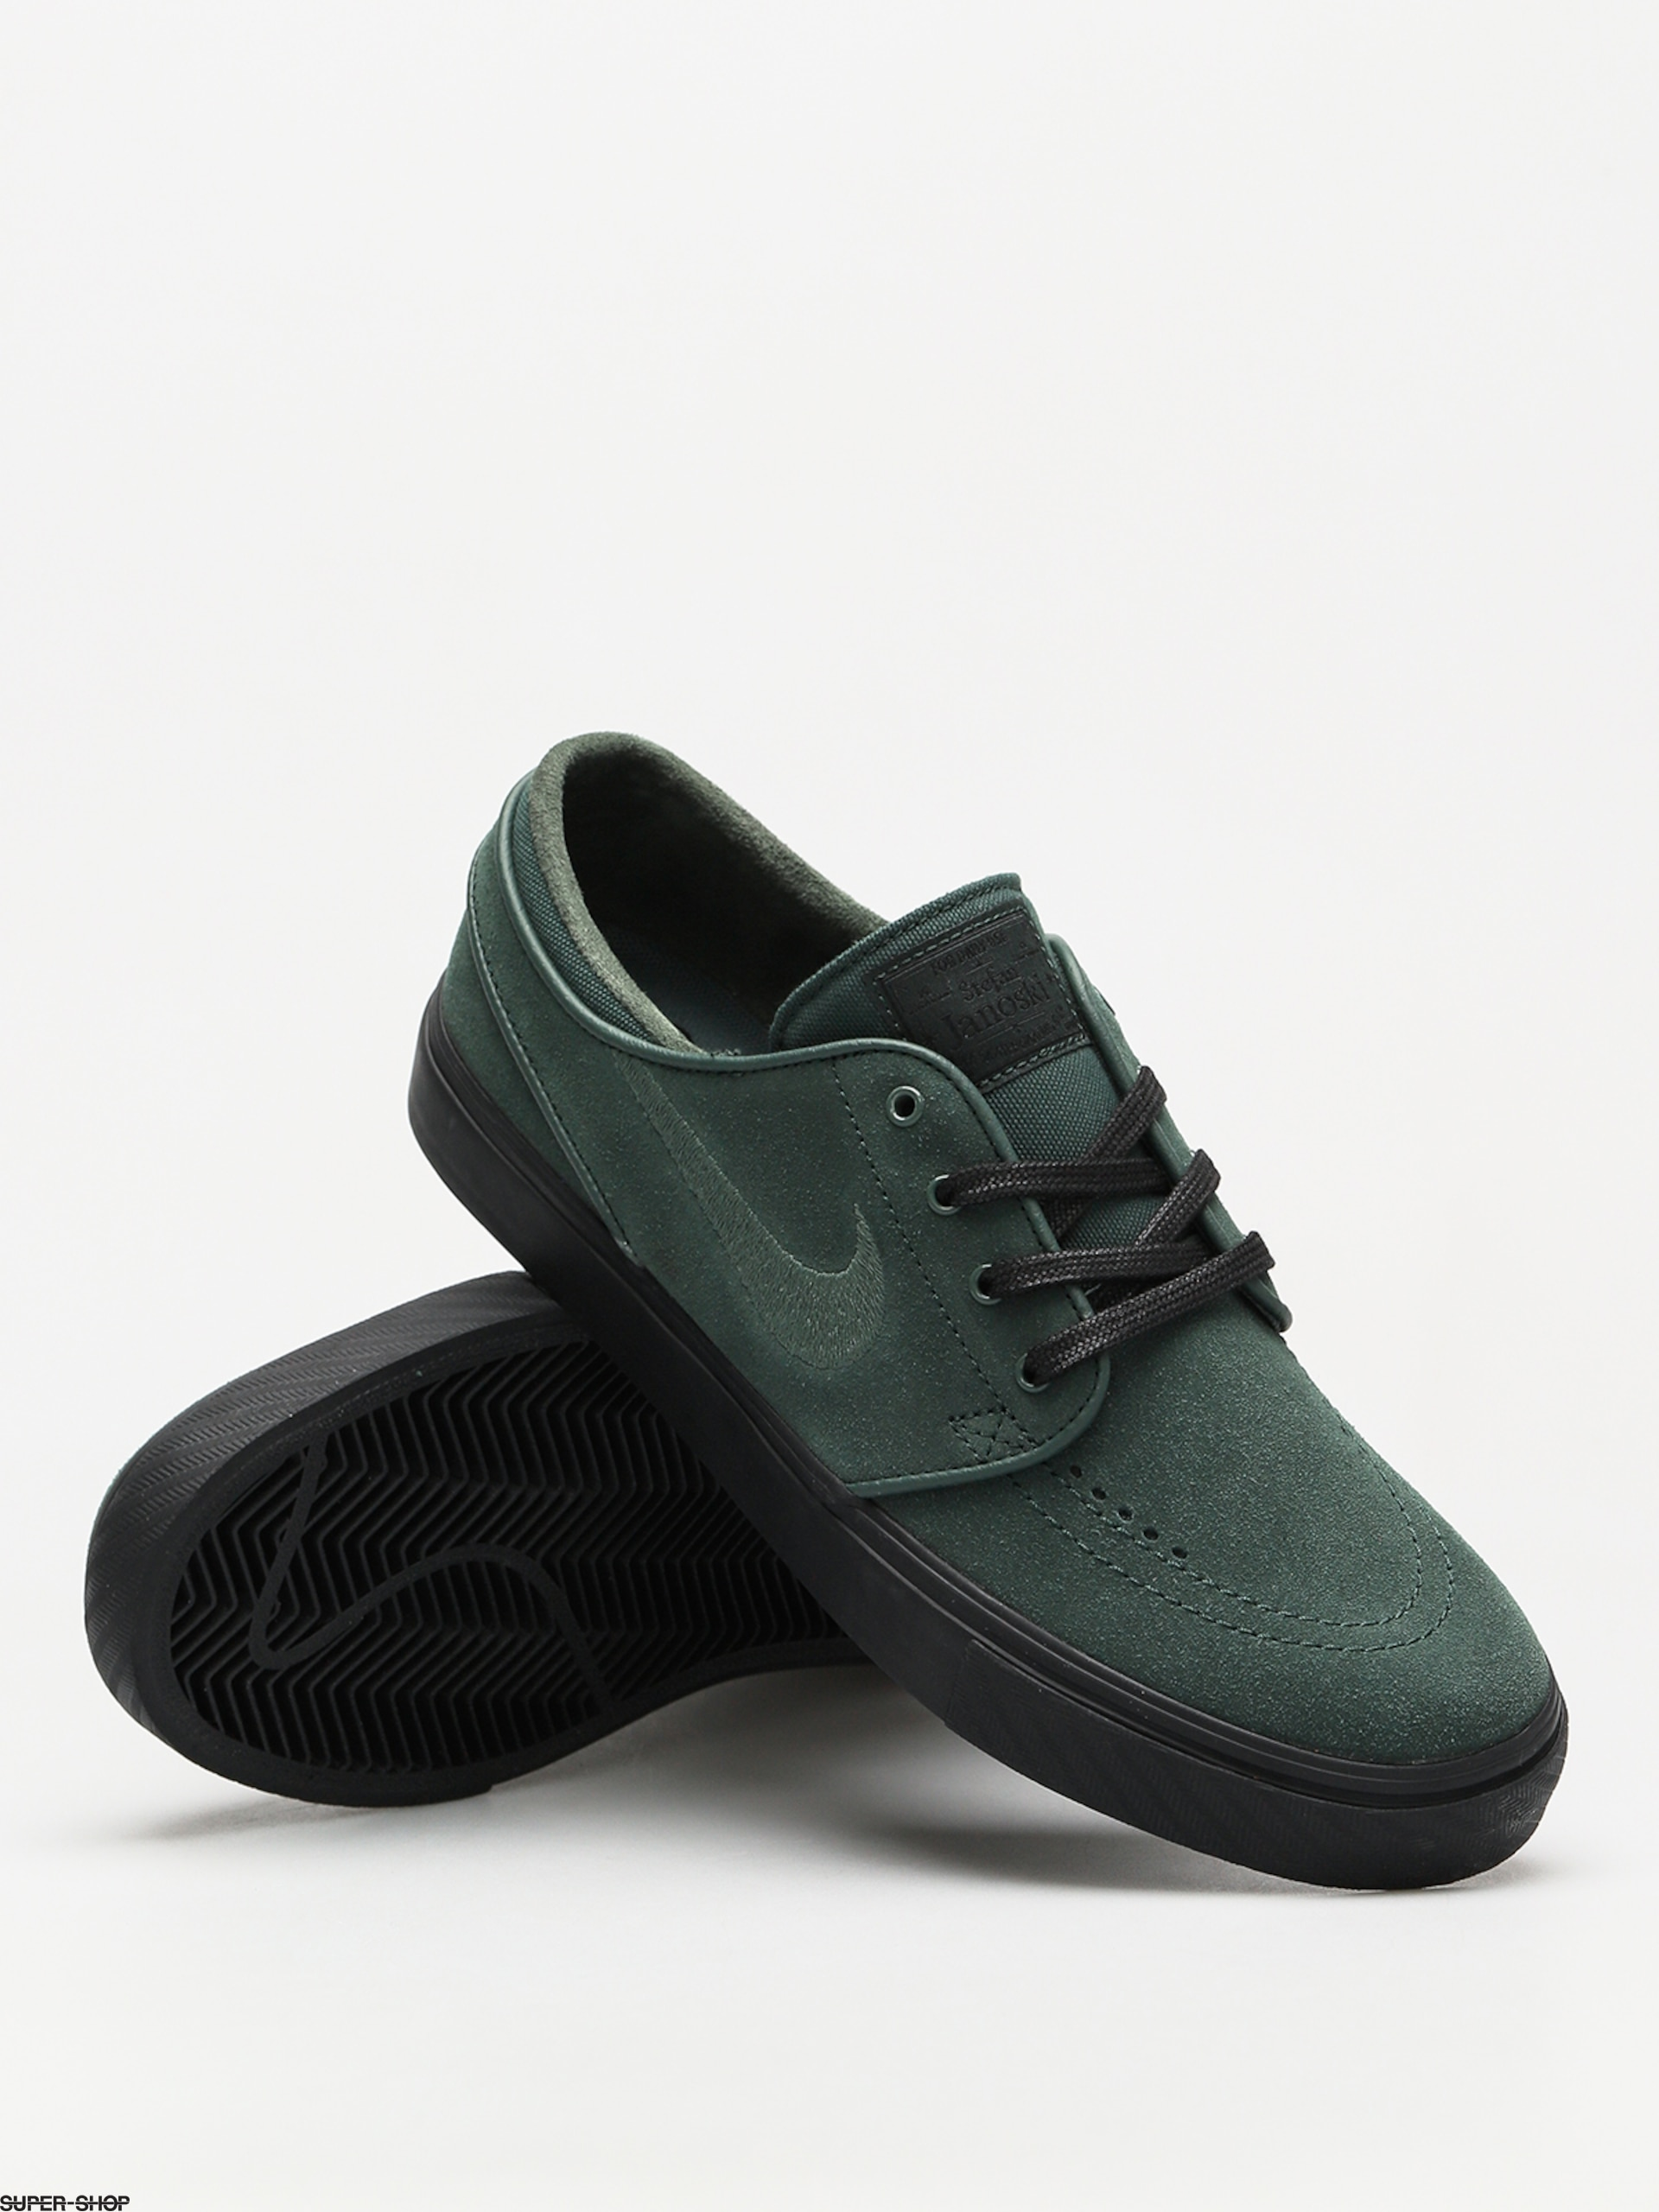 premium selection df9b9 44ddd Nike SB Shoes Zoom Stefan Janoski (midnight green midnight green black)